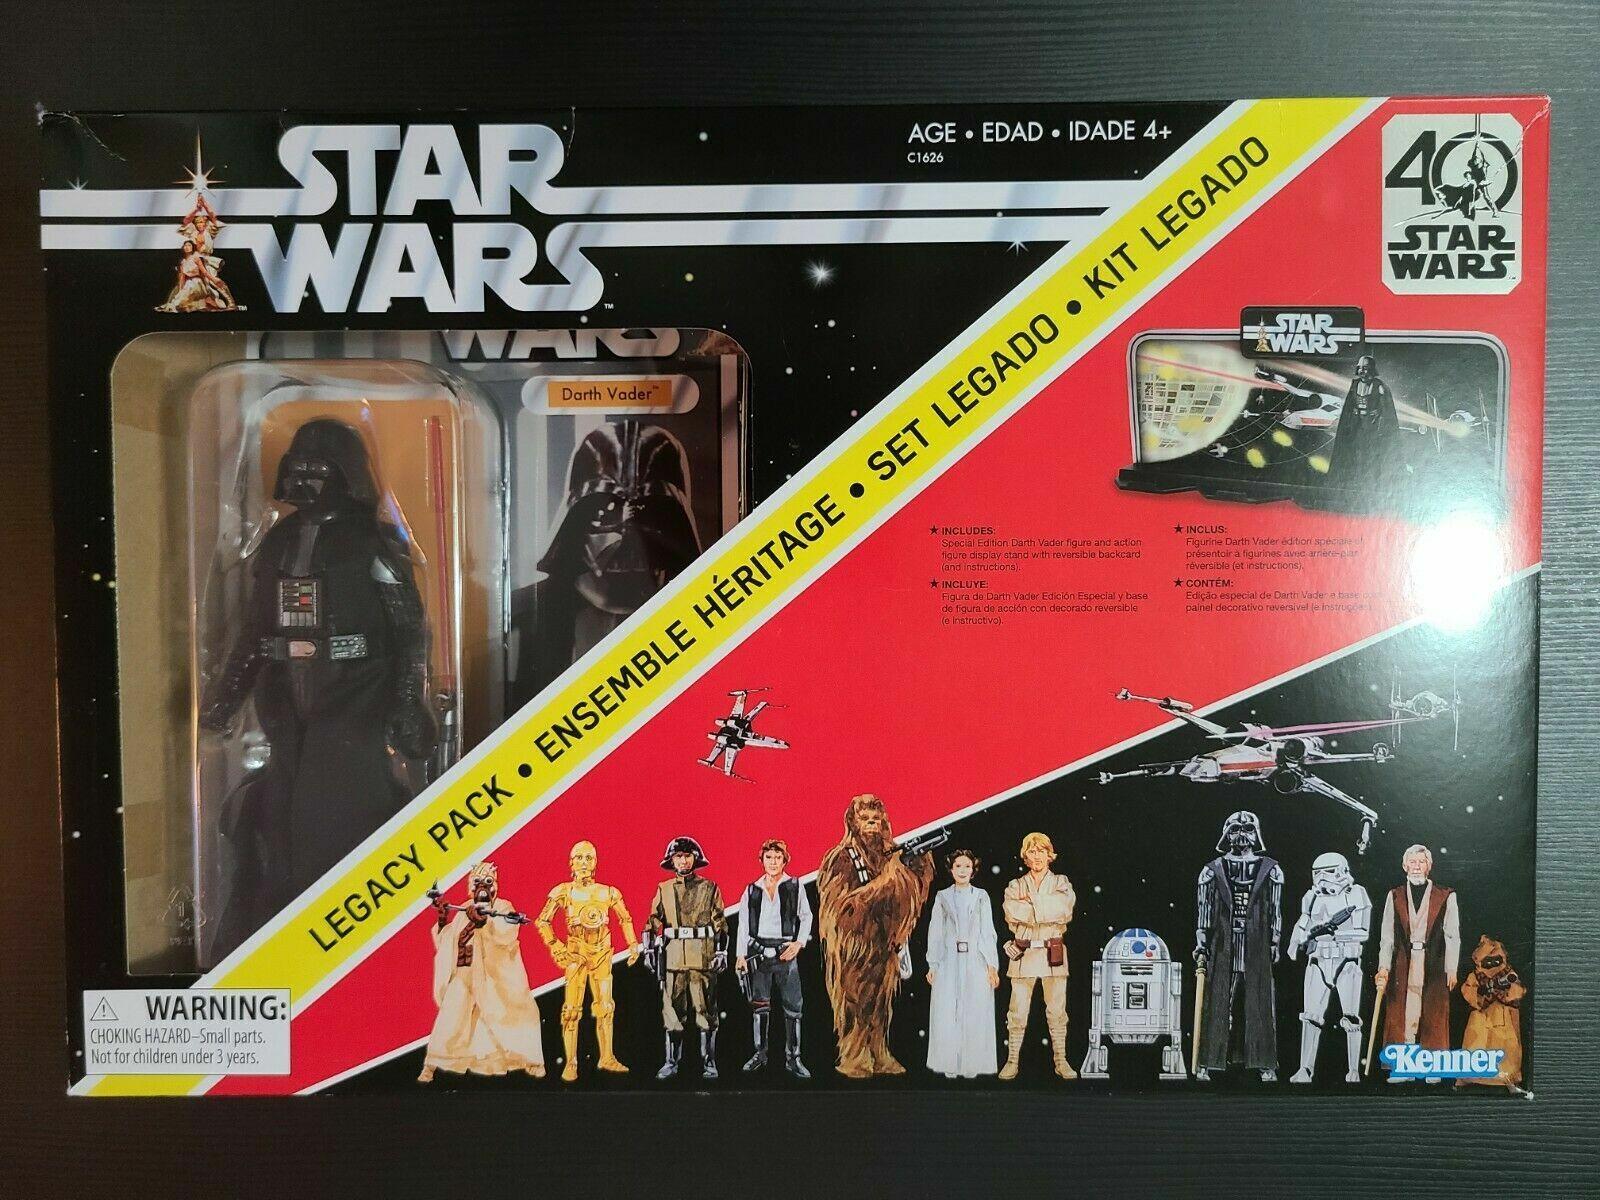 new in box environ 15.24 cm Star Wars Black Series 40th Anniversary Darth Vader 6 in